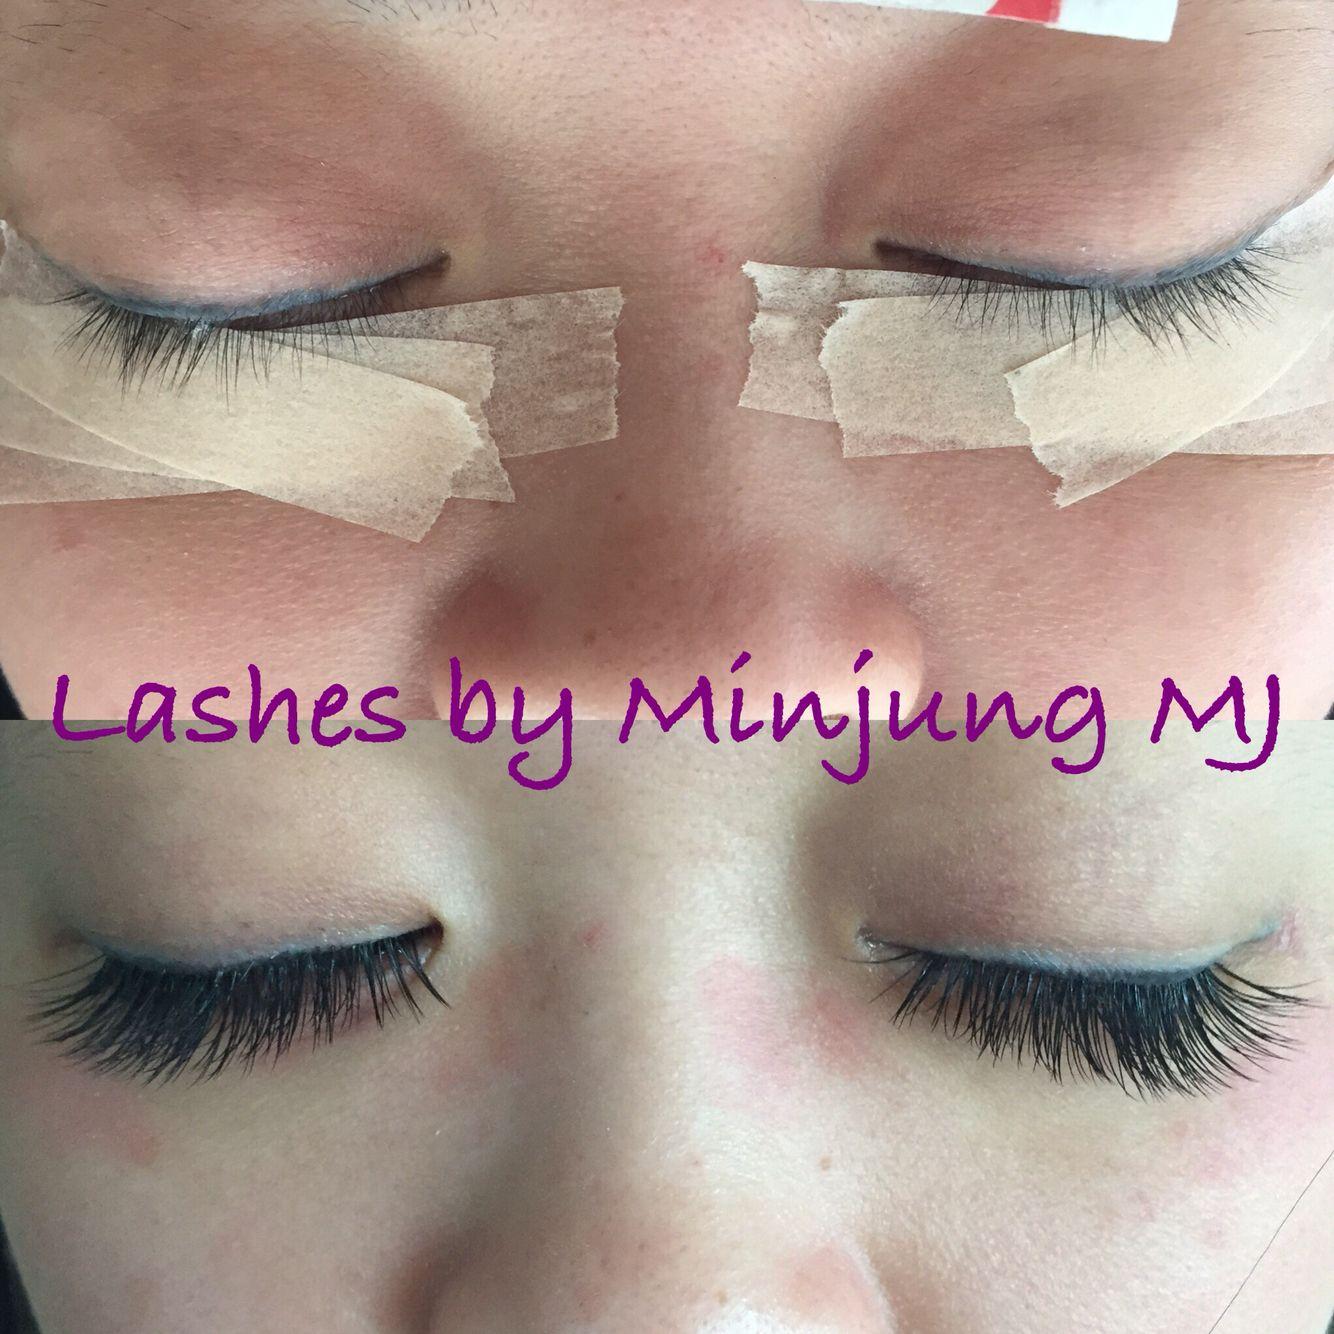 Lash extensions   #lashes#Lashextensions#eyelash#beauty#vancouver#minding#minjung#nail    Minding1204@gmail.com